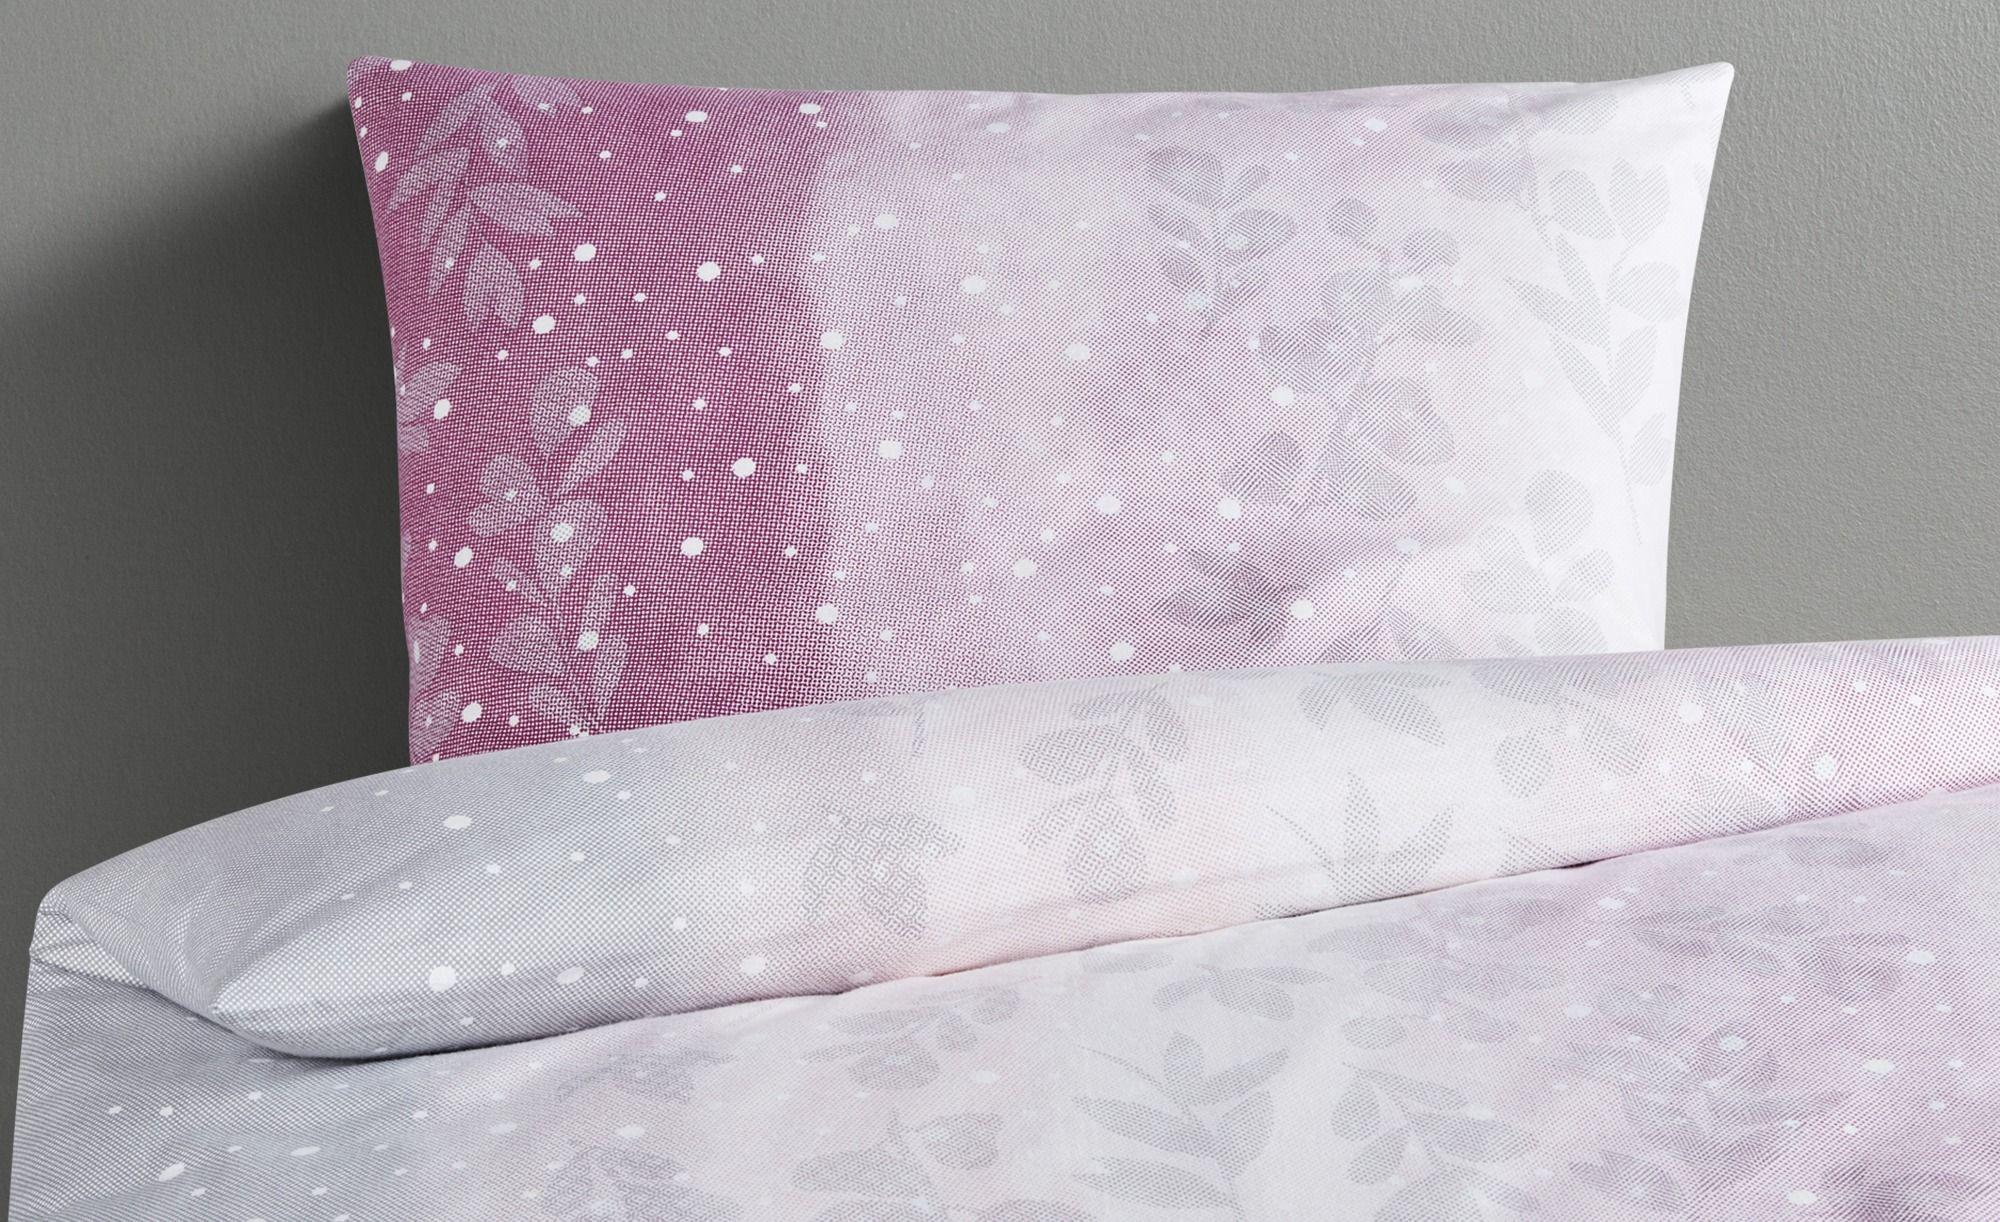 Lavida Biber Bettwasche Chasabo Bettwasche Rot Bettwasche